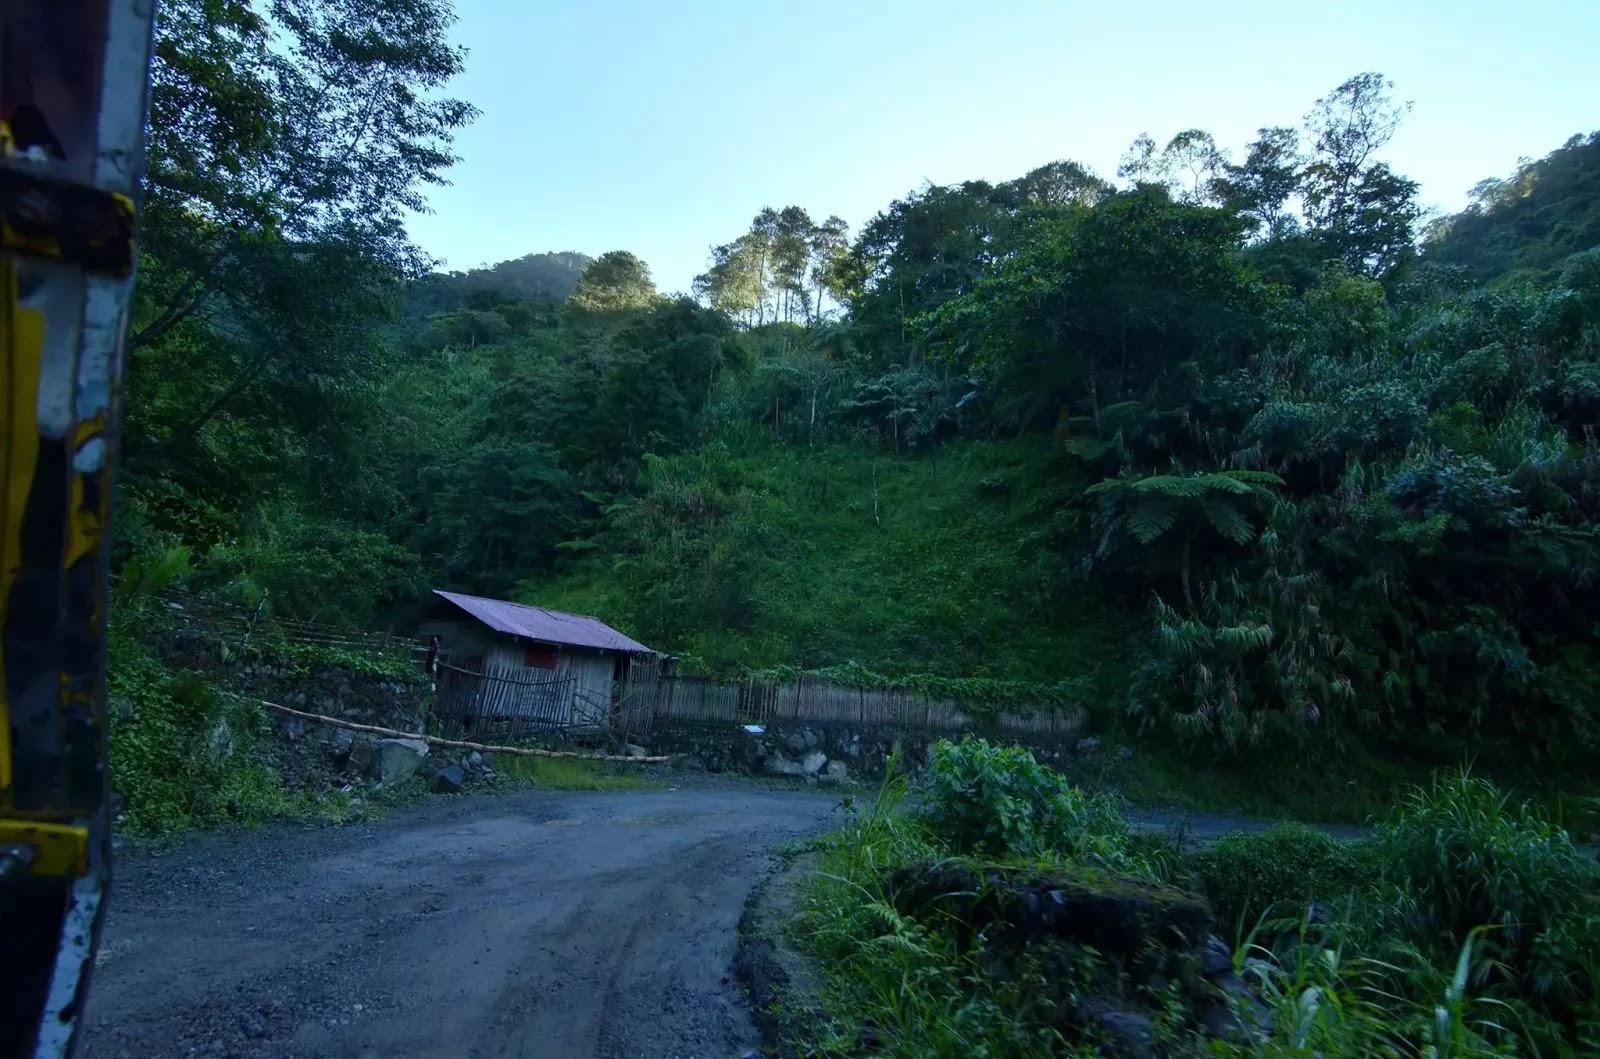 Bangaan Roads Ifugao Cordillera Administrative Region Philippines